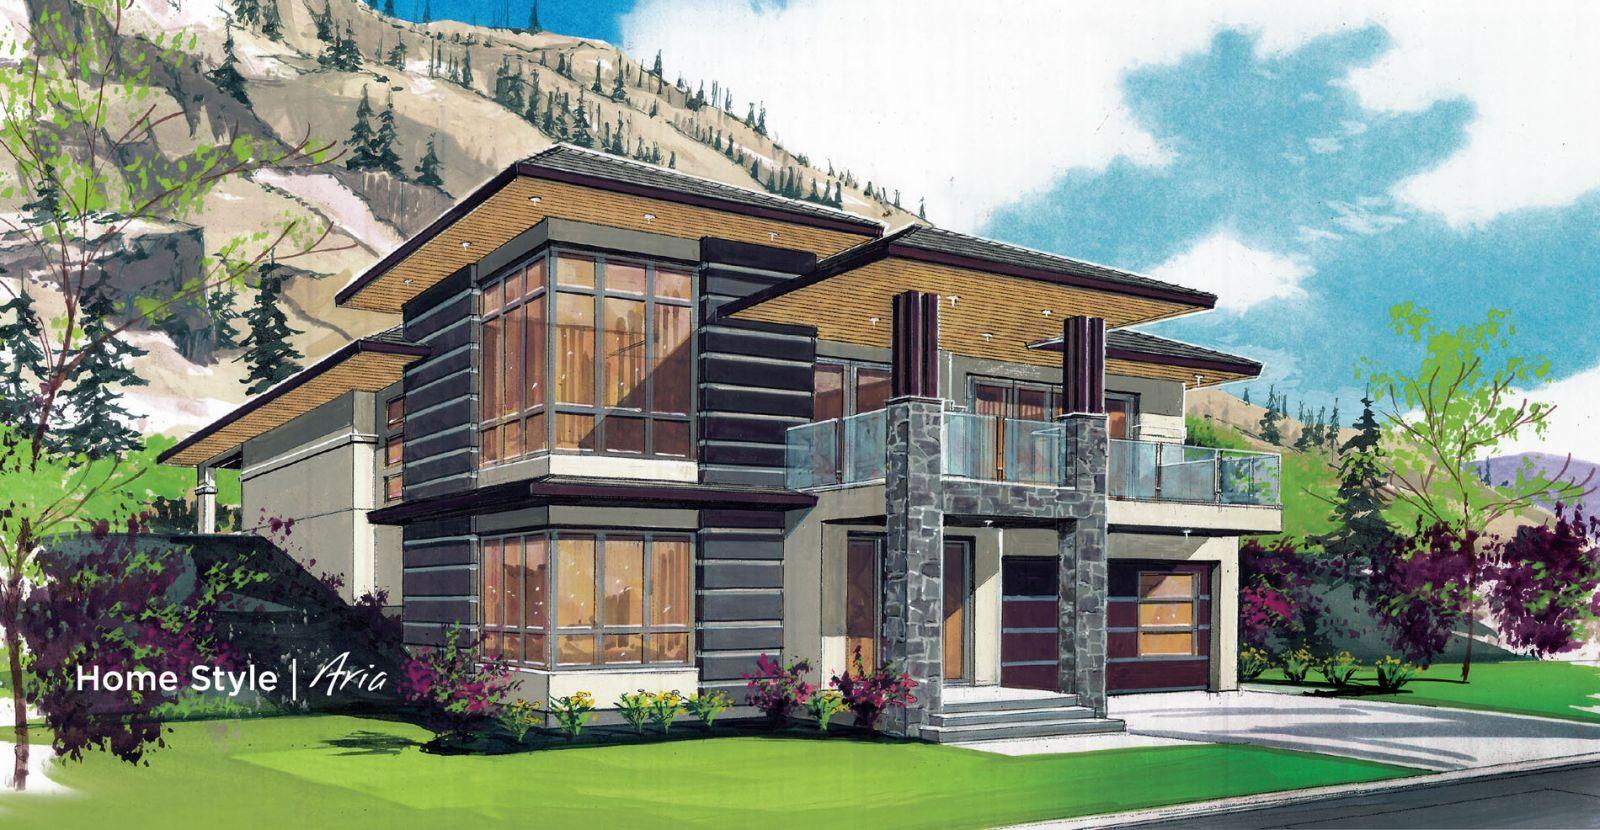 Kettle Valley S History New Neighbourhood New Design